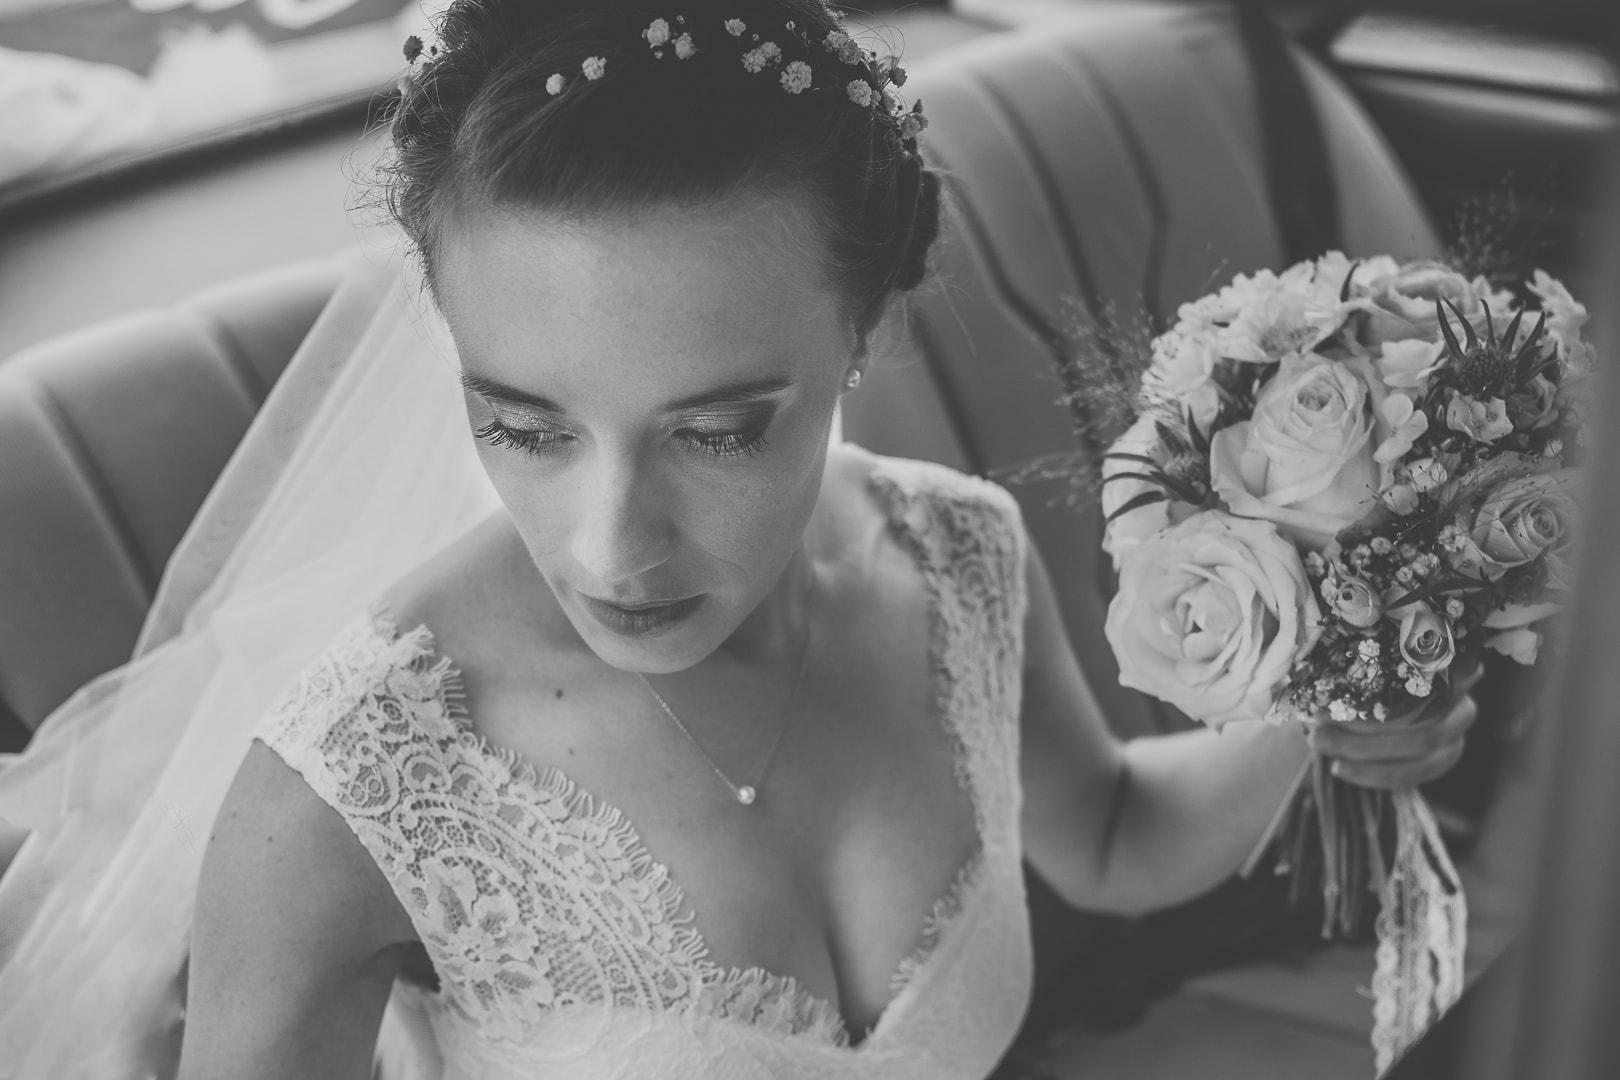 trezors-photography-photographe-professionnel-toulouse-31-mariage-reportage-photo-lifestyle (13)